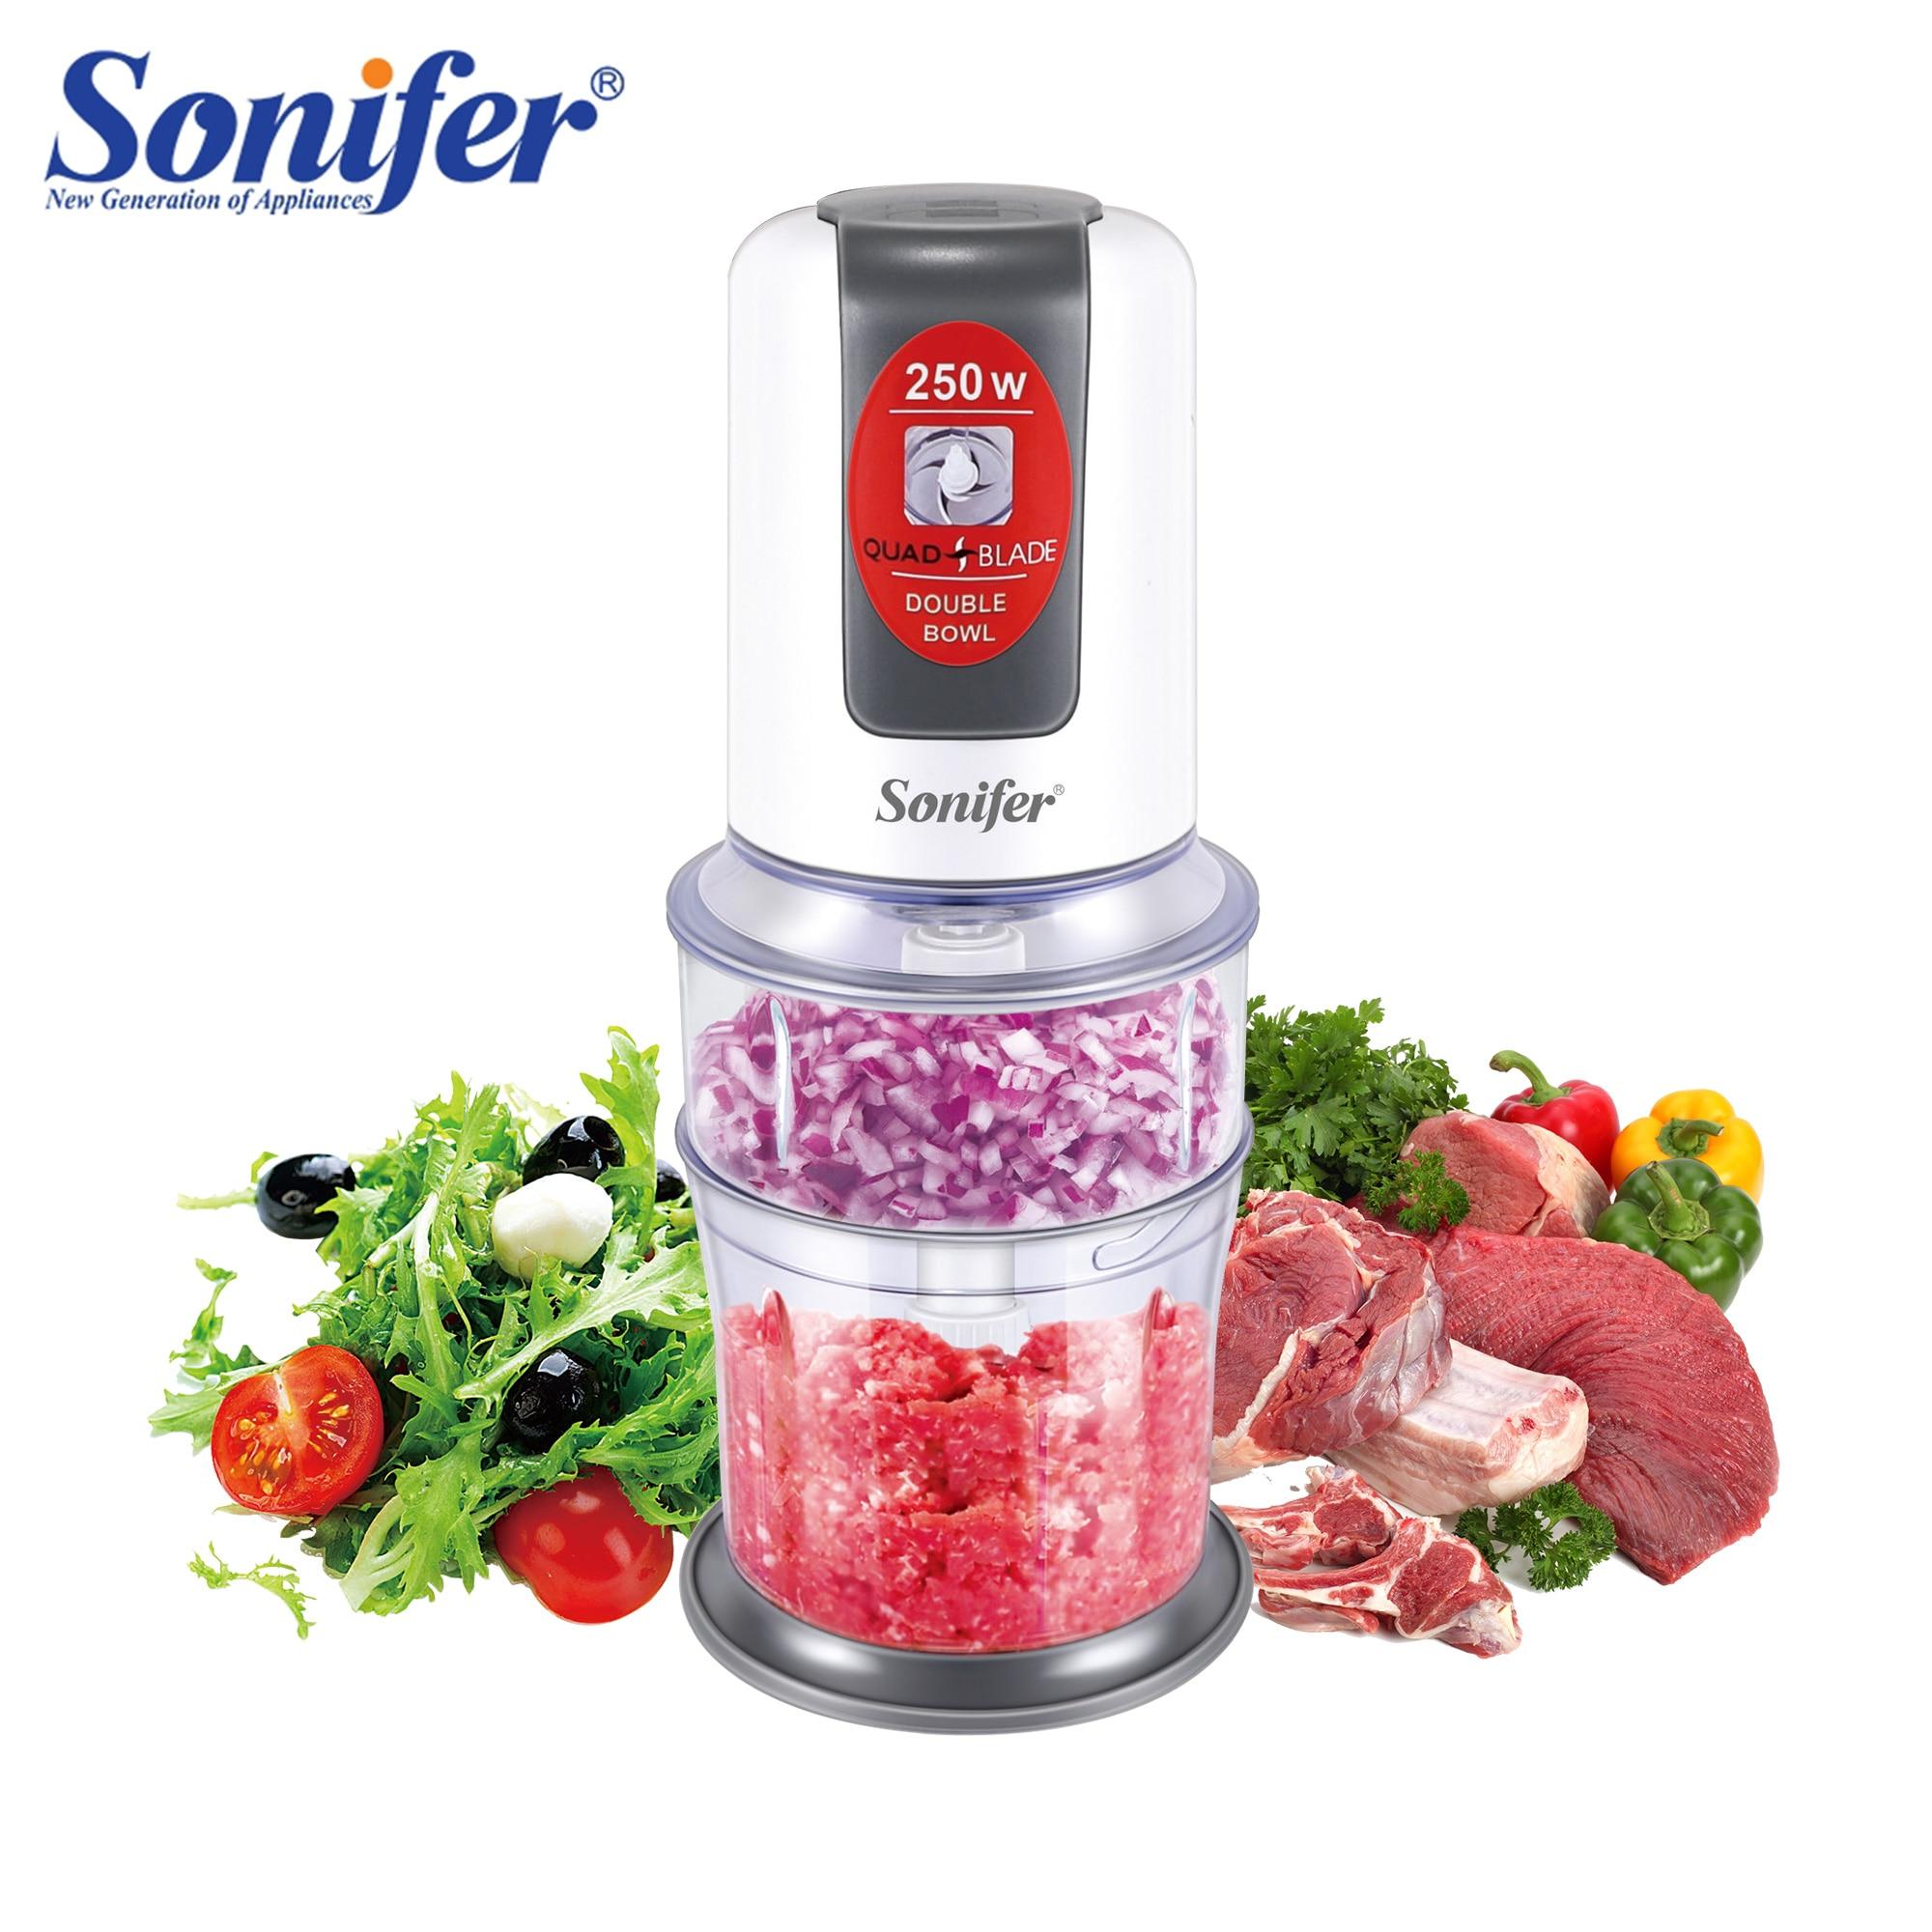 Multifunción cortador de alimentos cortador eléctrico de verduras espiral carne fruta triturador rebanador procesador de alimentos para cocina 220V Sonifer